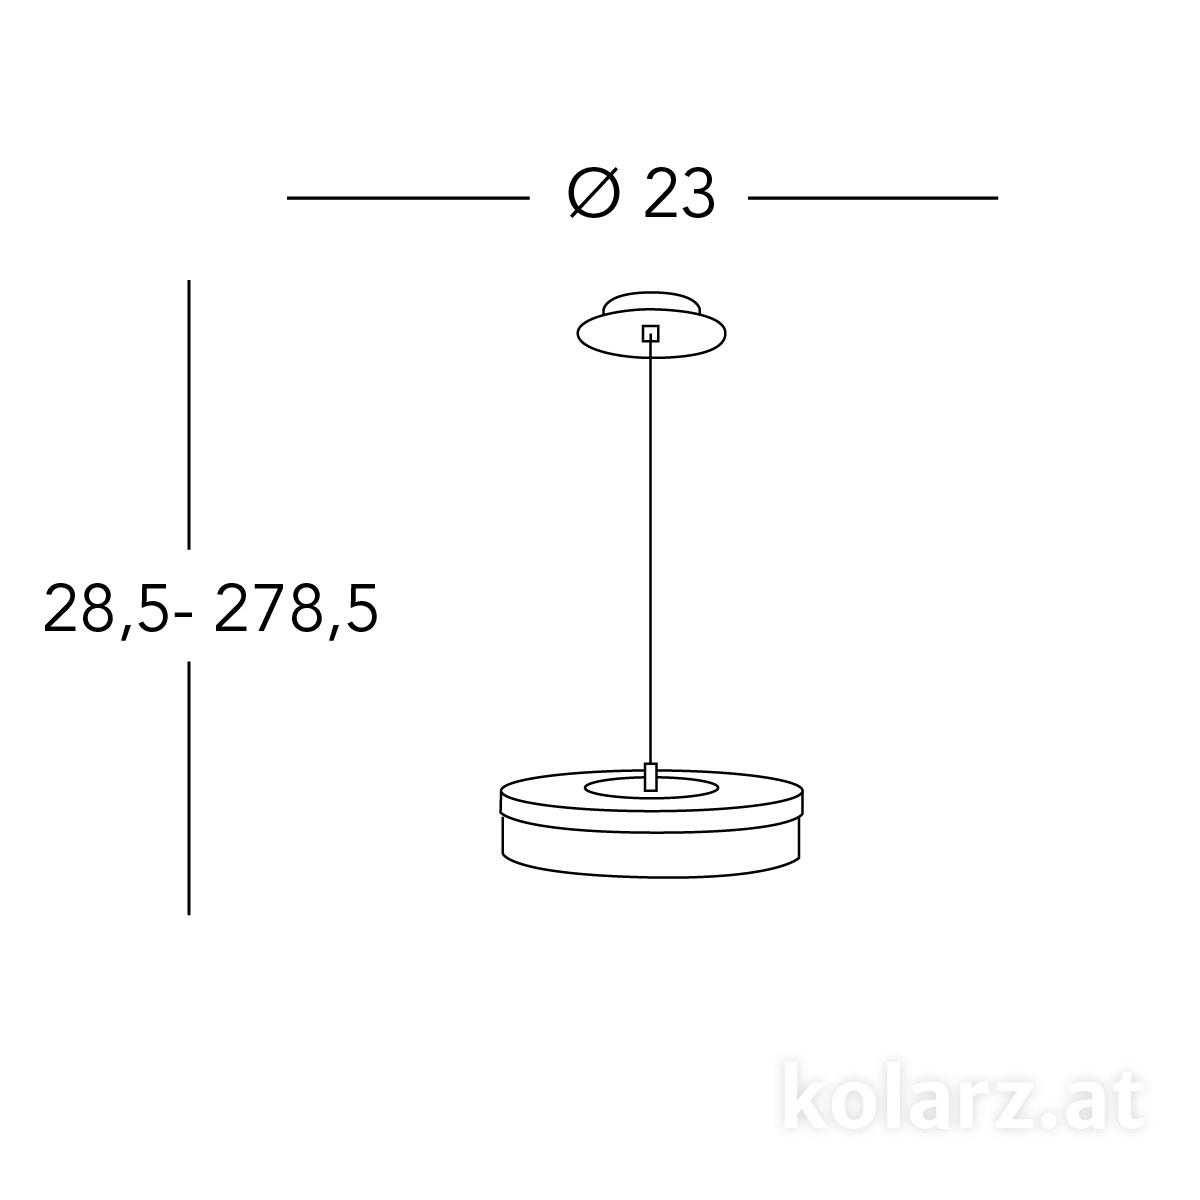 6020-30150-s1.jpg